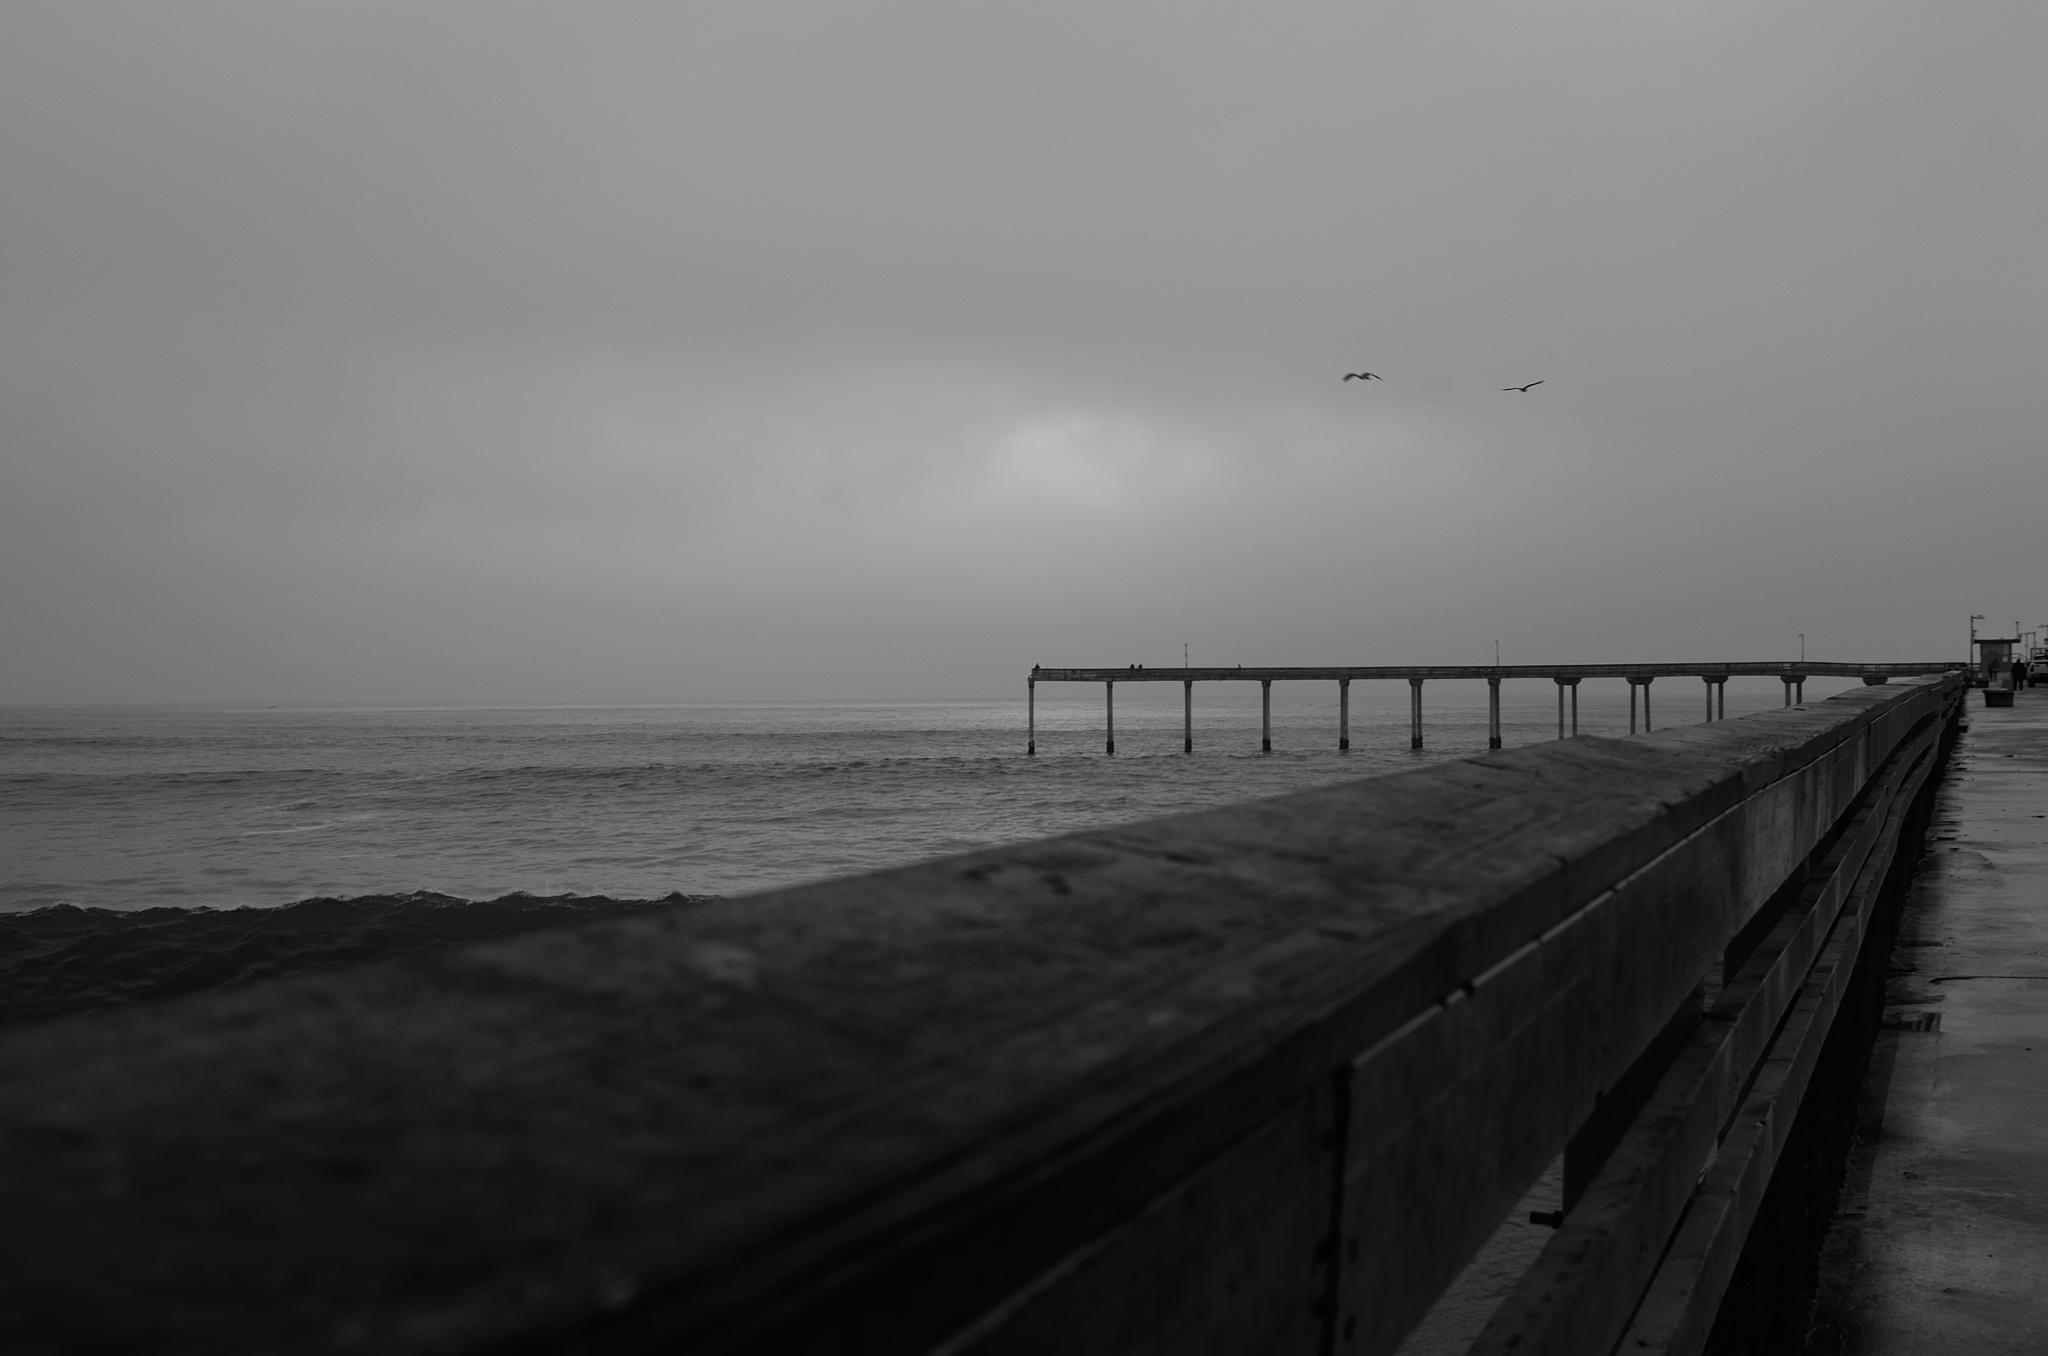 Pier in OB by Andrew Fuchs